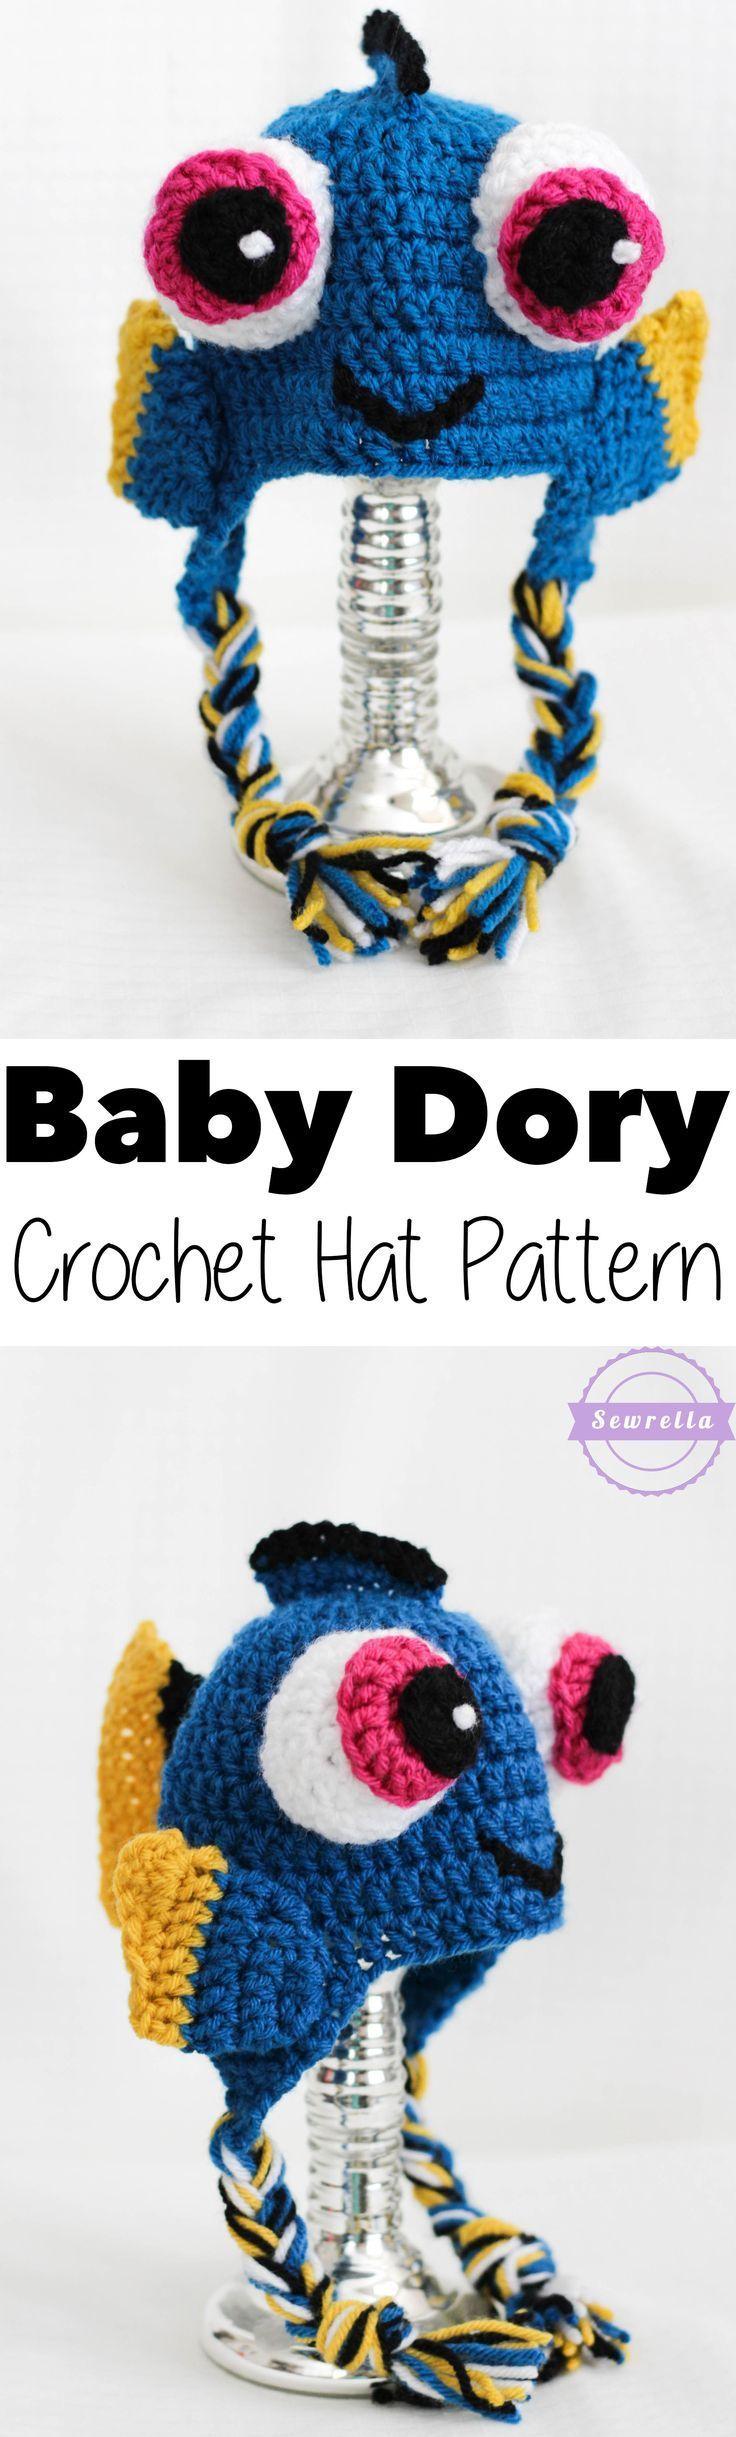 Baby Dory Crochet Hat | Free Pattern from Sewrella | Crocheting ...